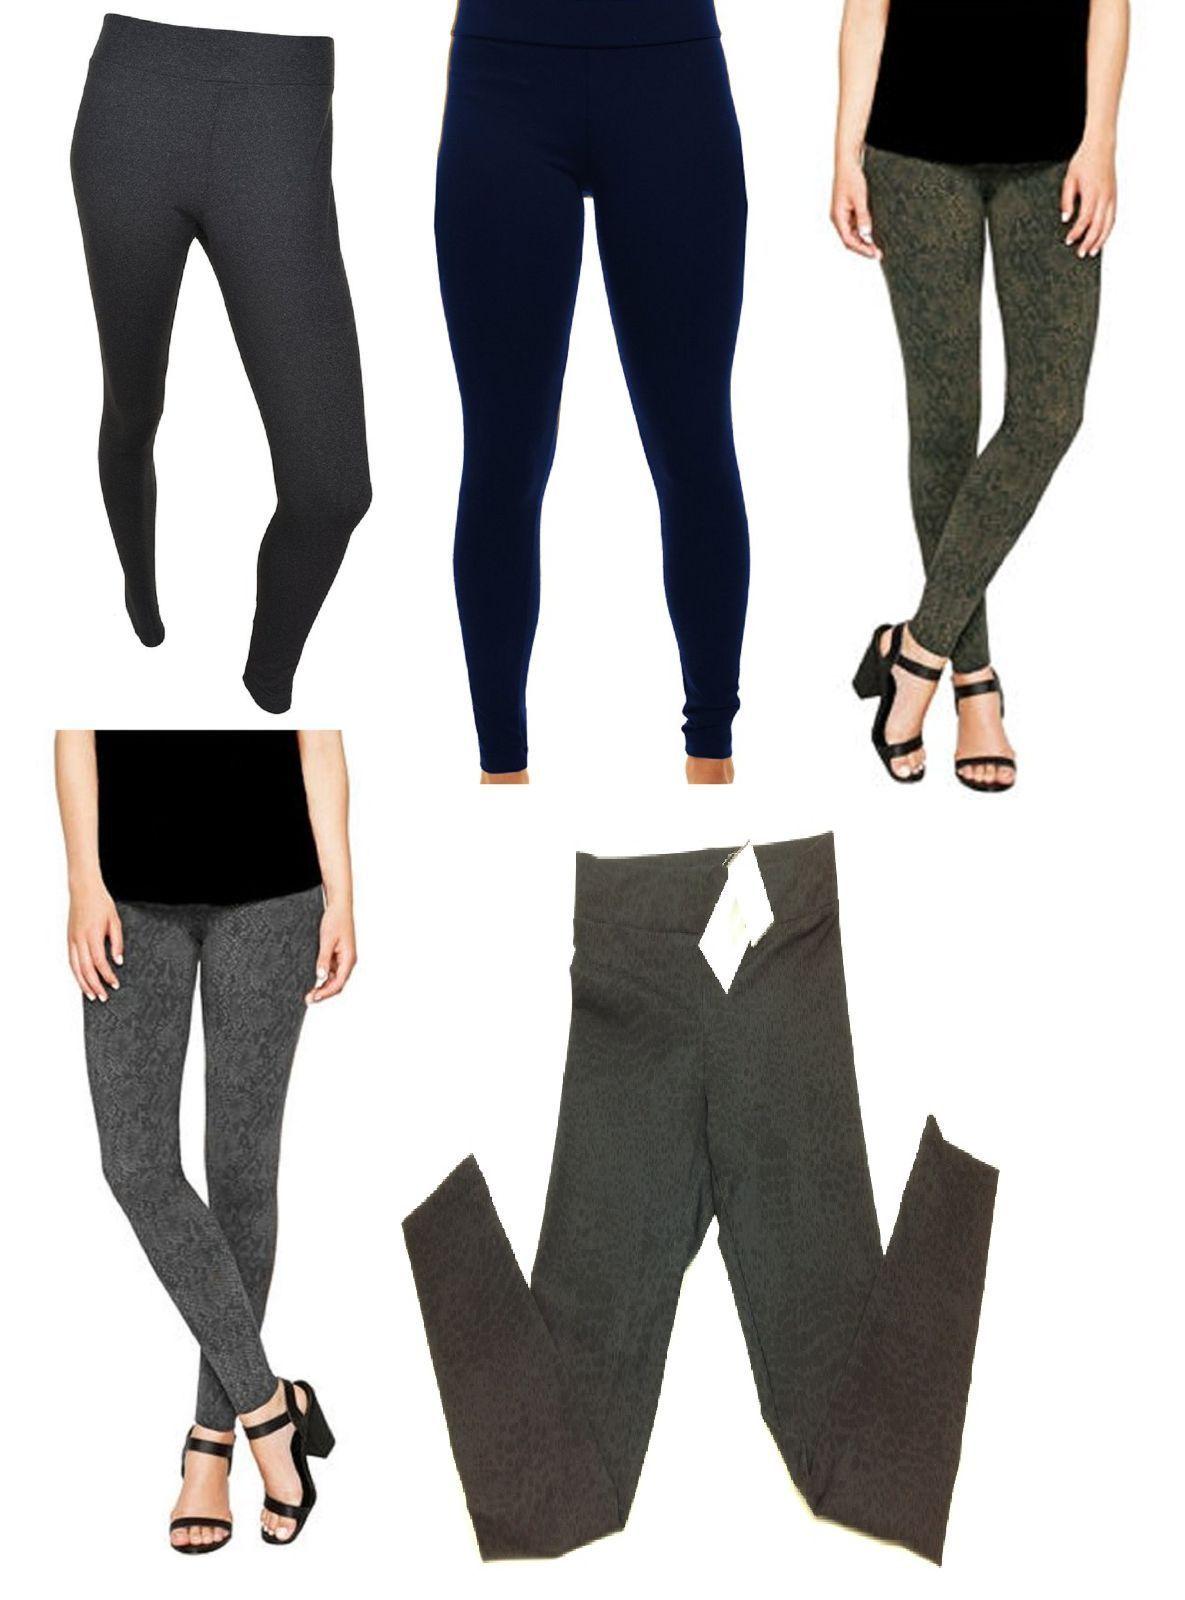 Matty M Ladies' Legging, Thicker Material, Wide Waist Band